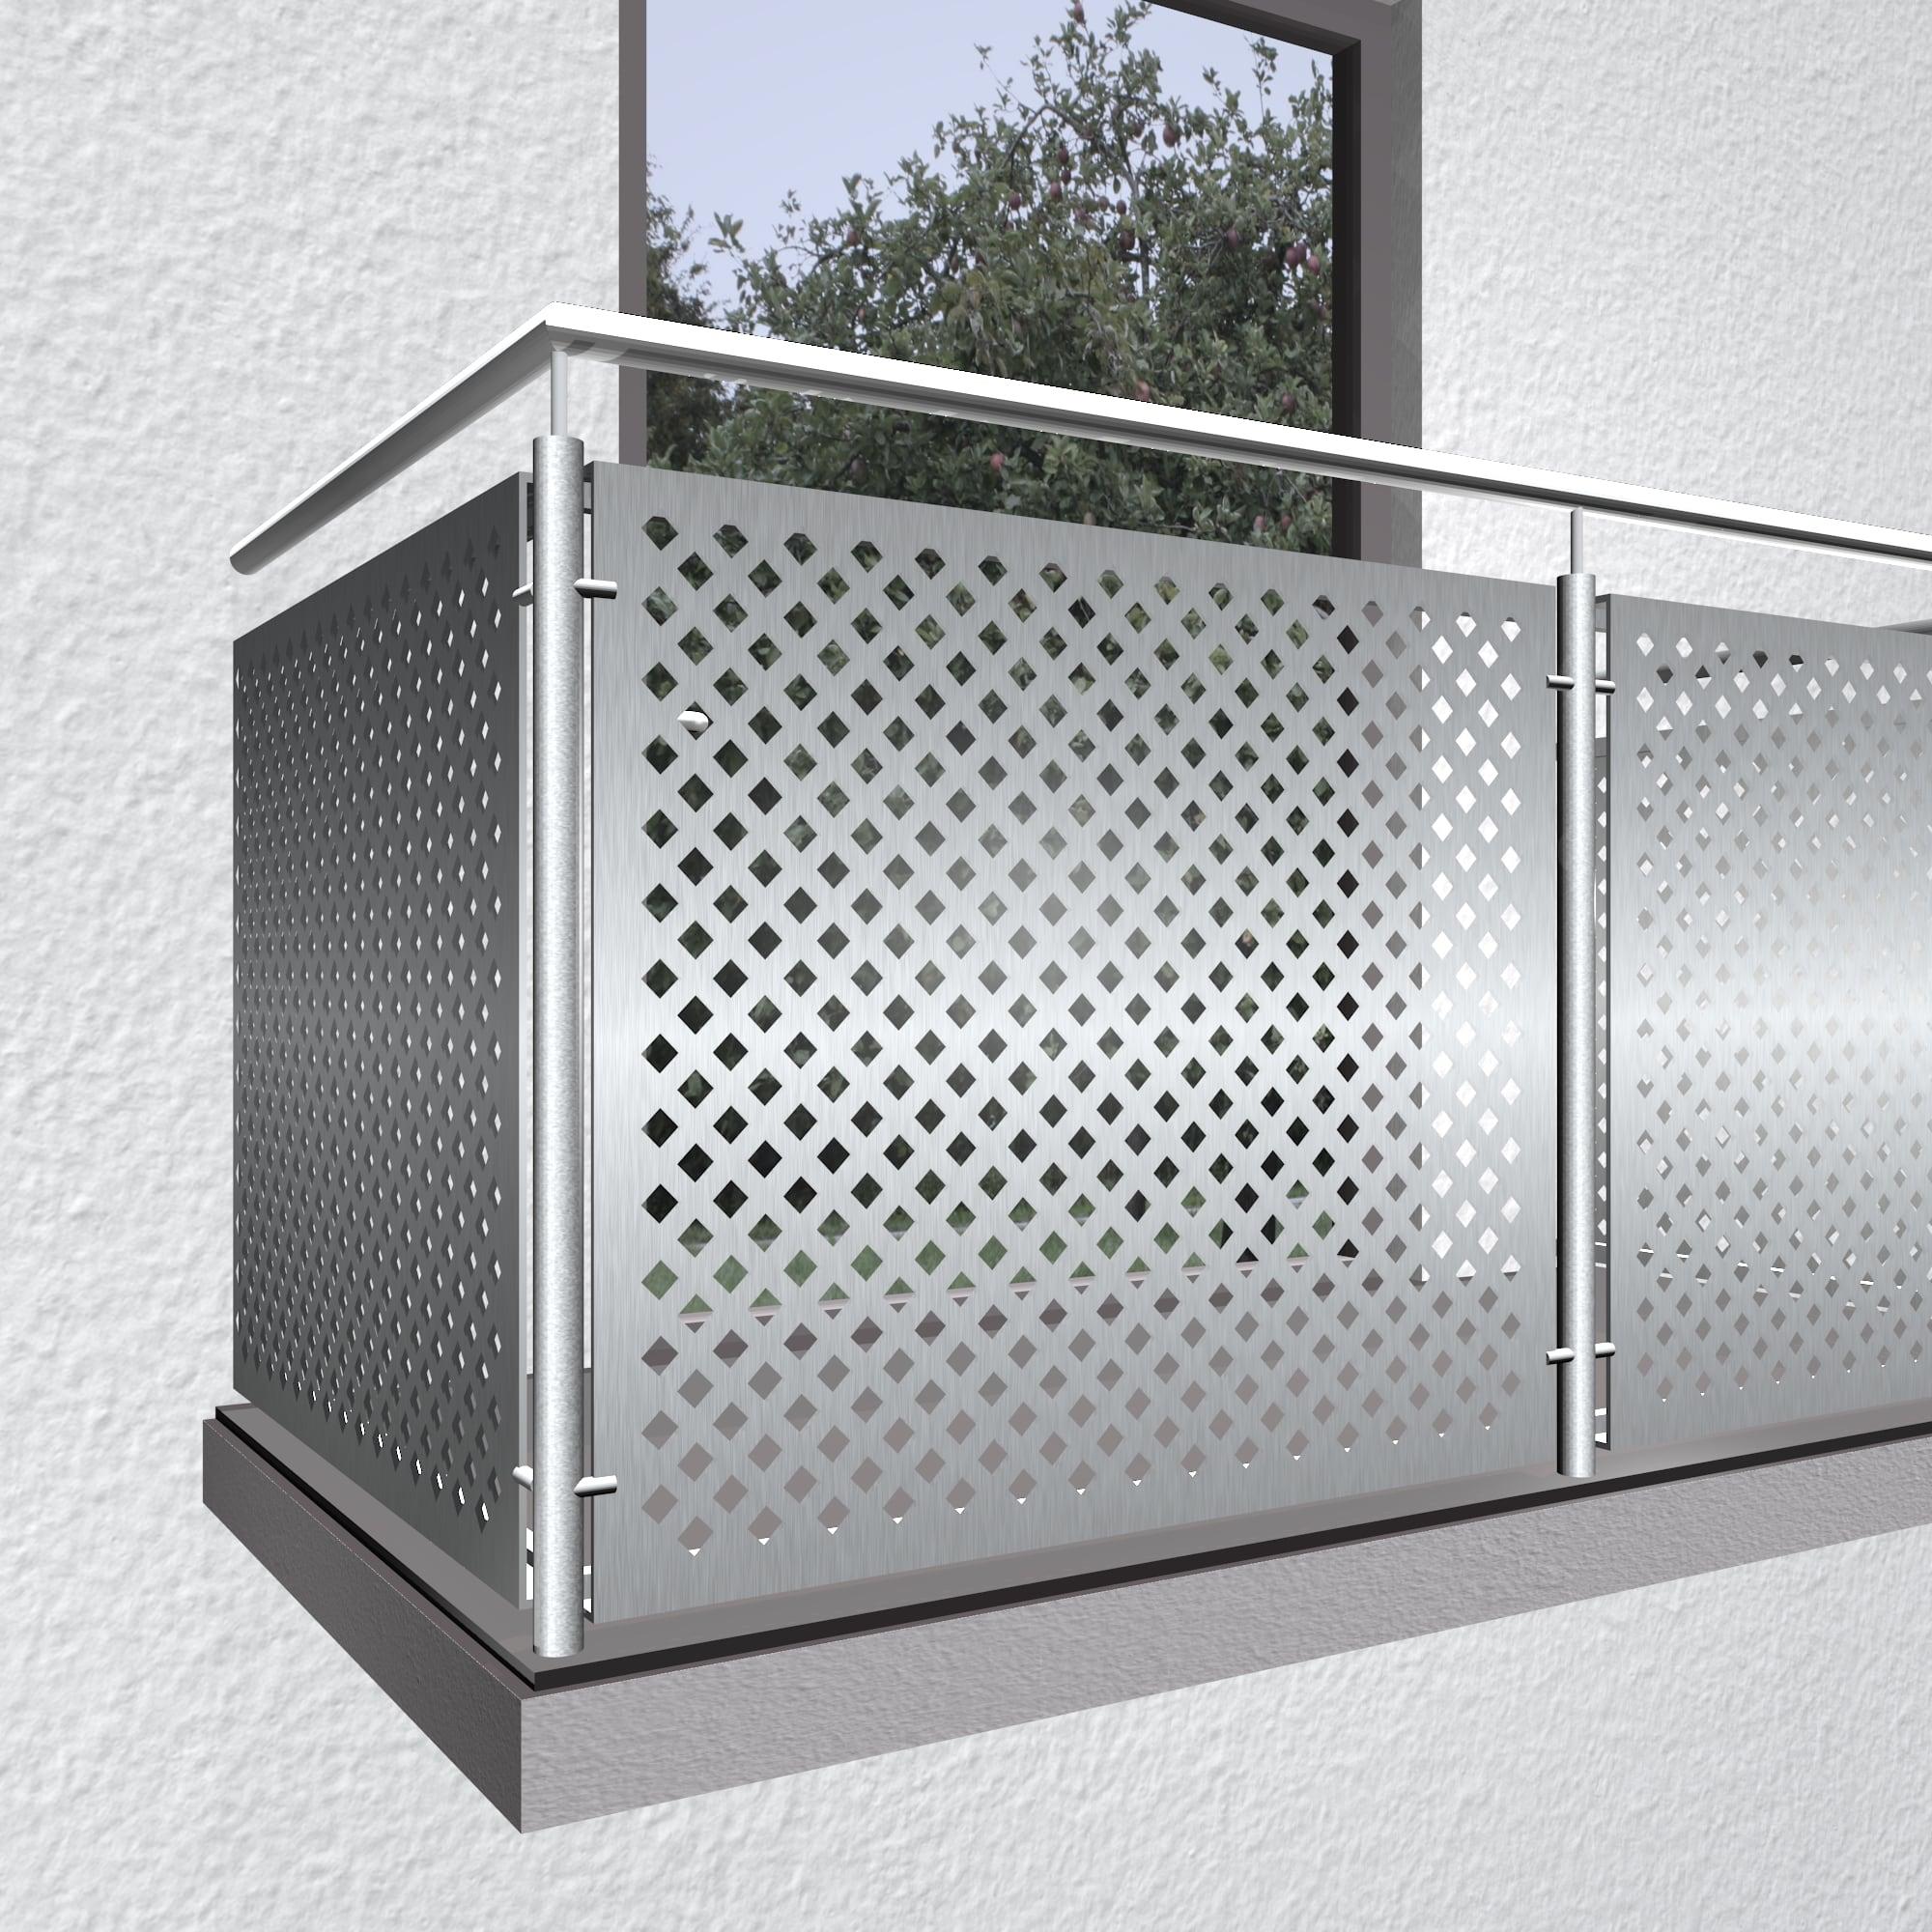 Balkonverkleidung Edelstahl QL DI VE